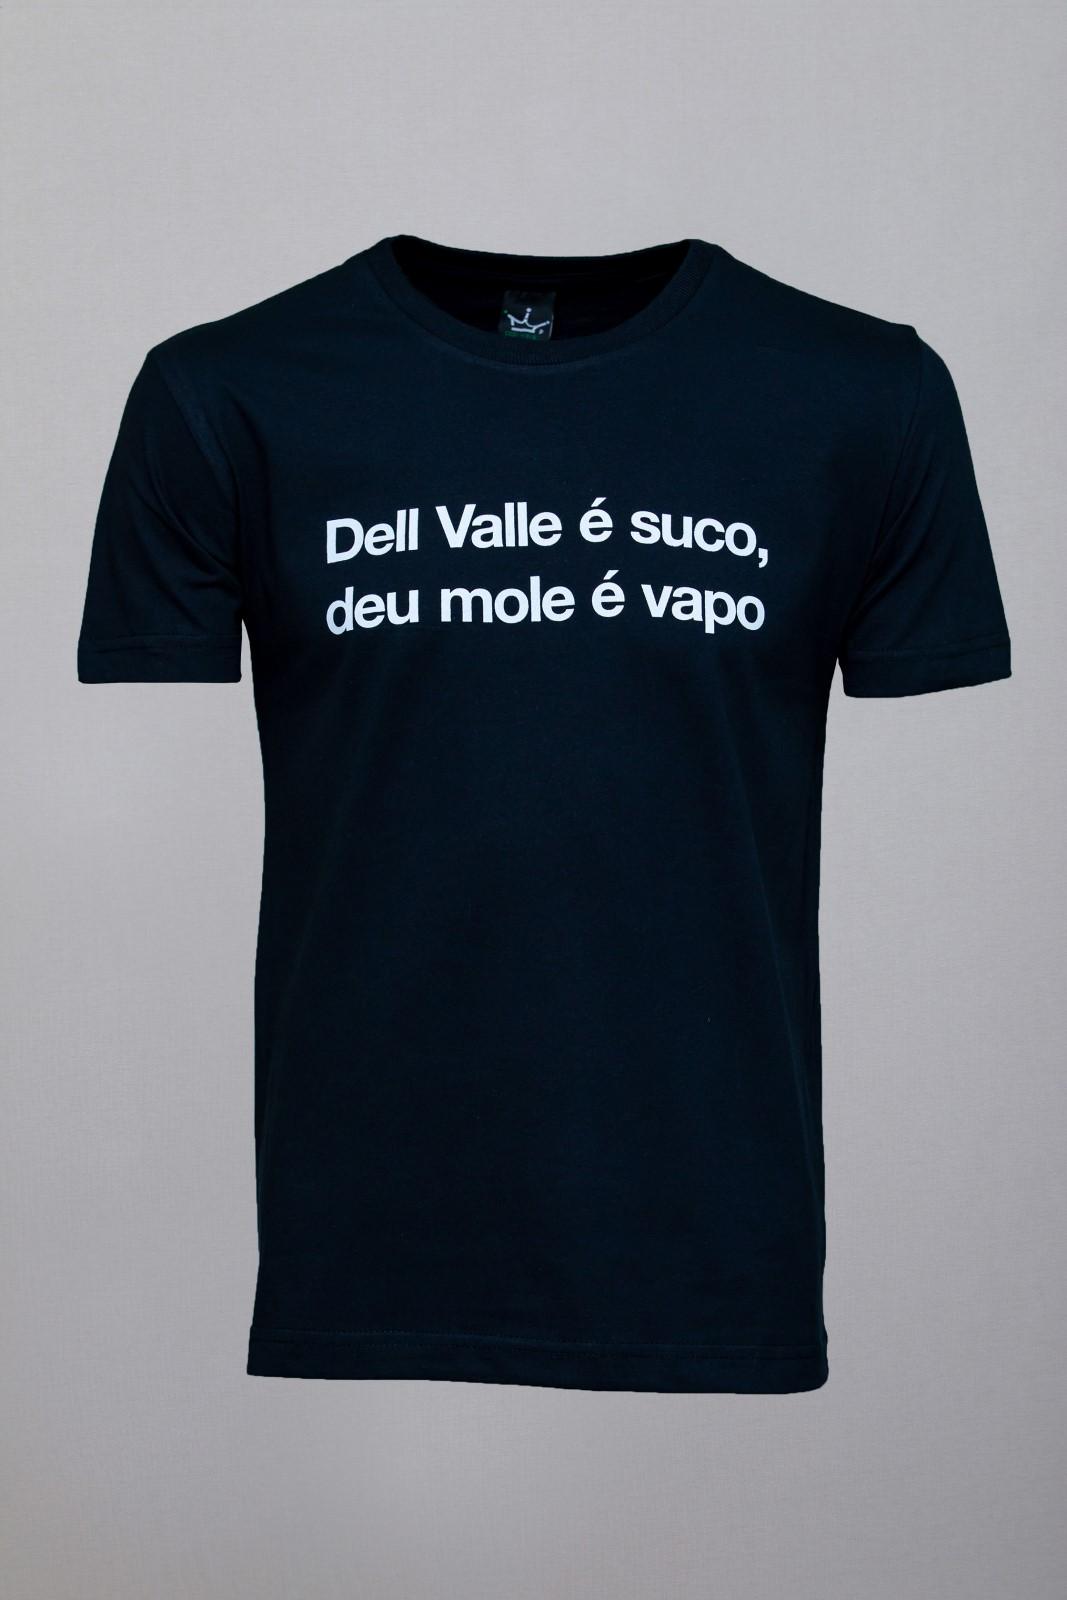 Camiseta CoolWave Dell Vale-Deu Mole